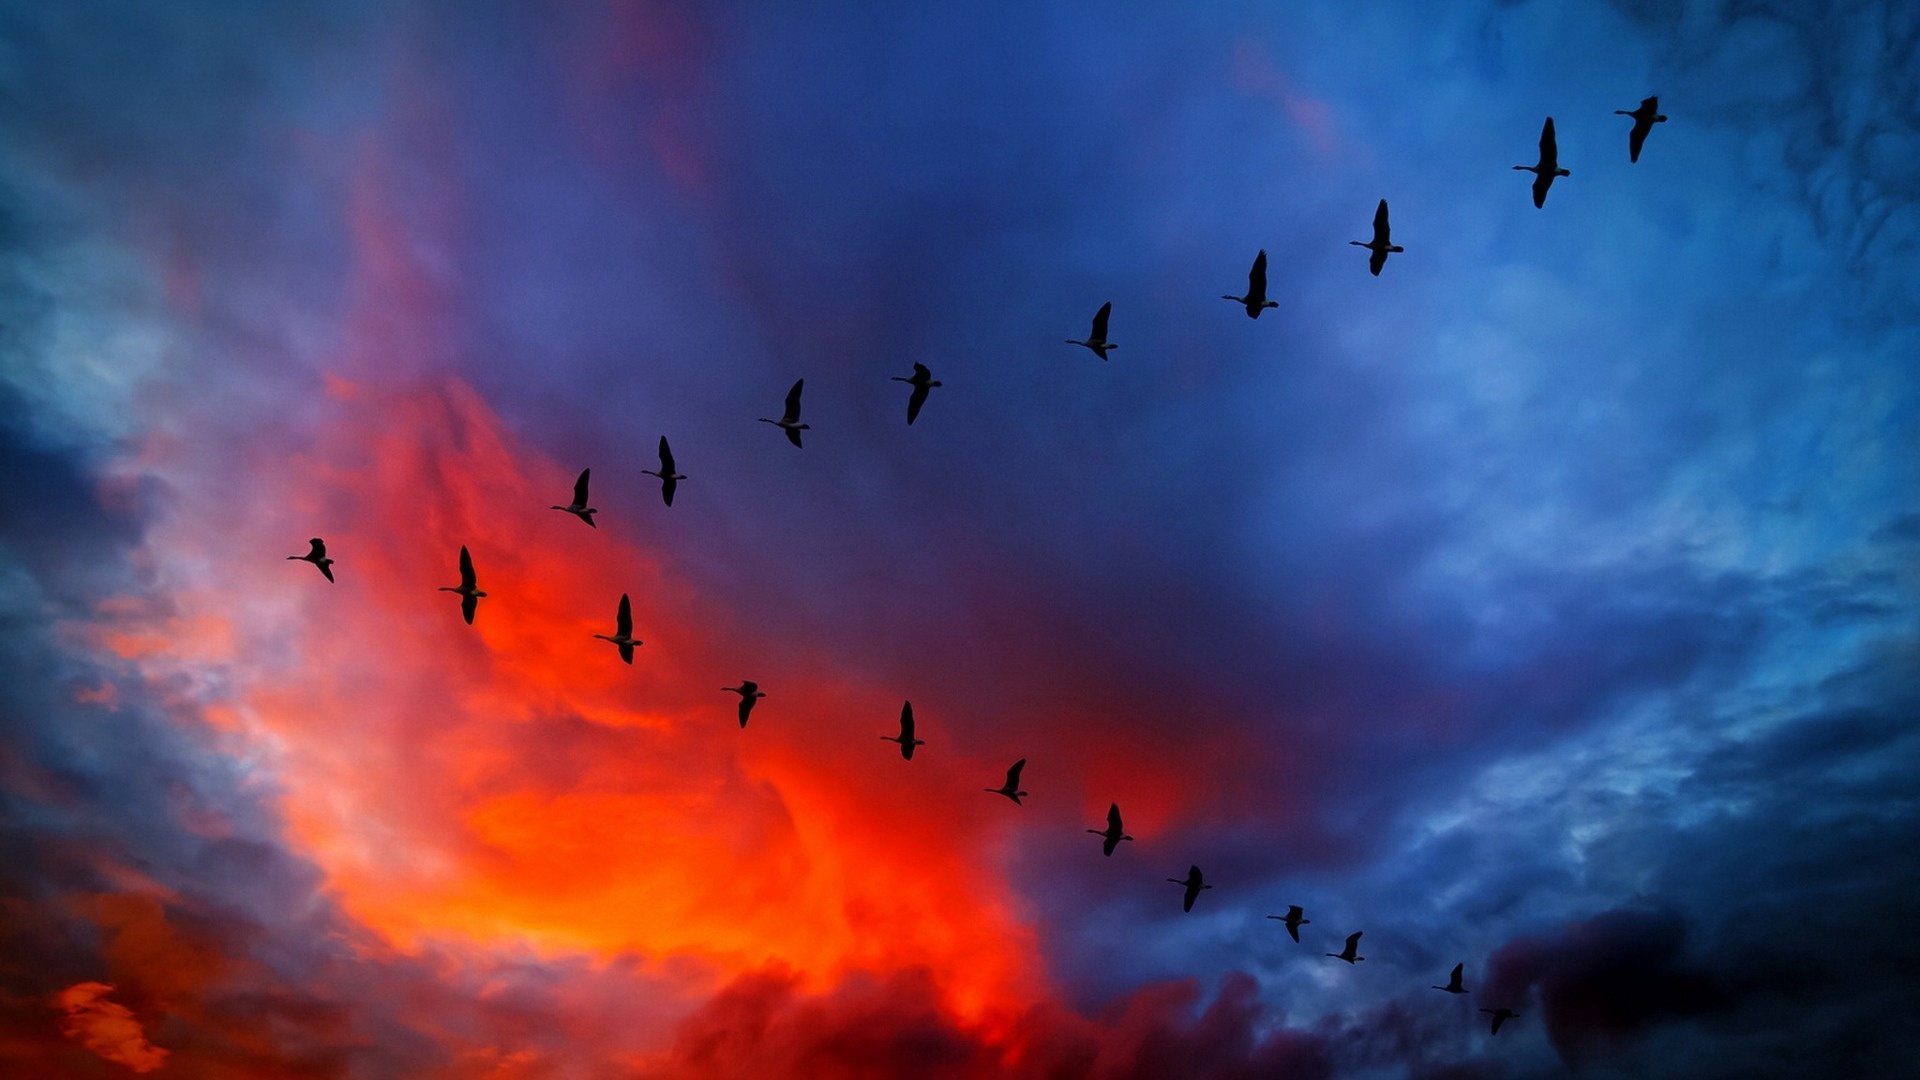 Wedge Birds In The Sky wallpaper photo hd